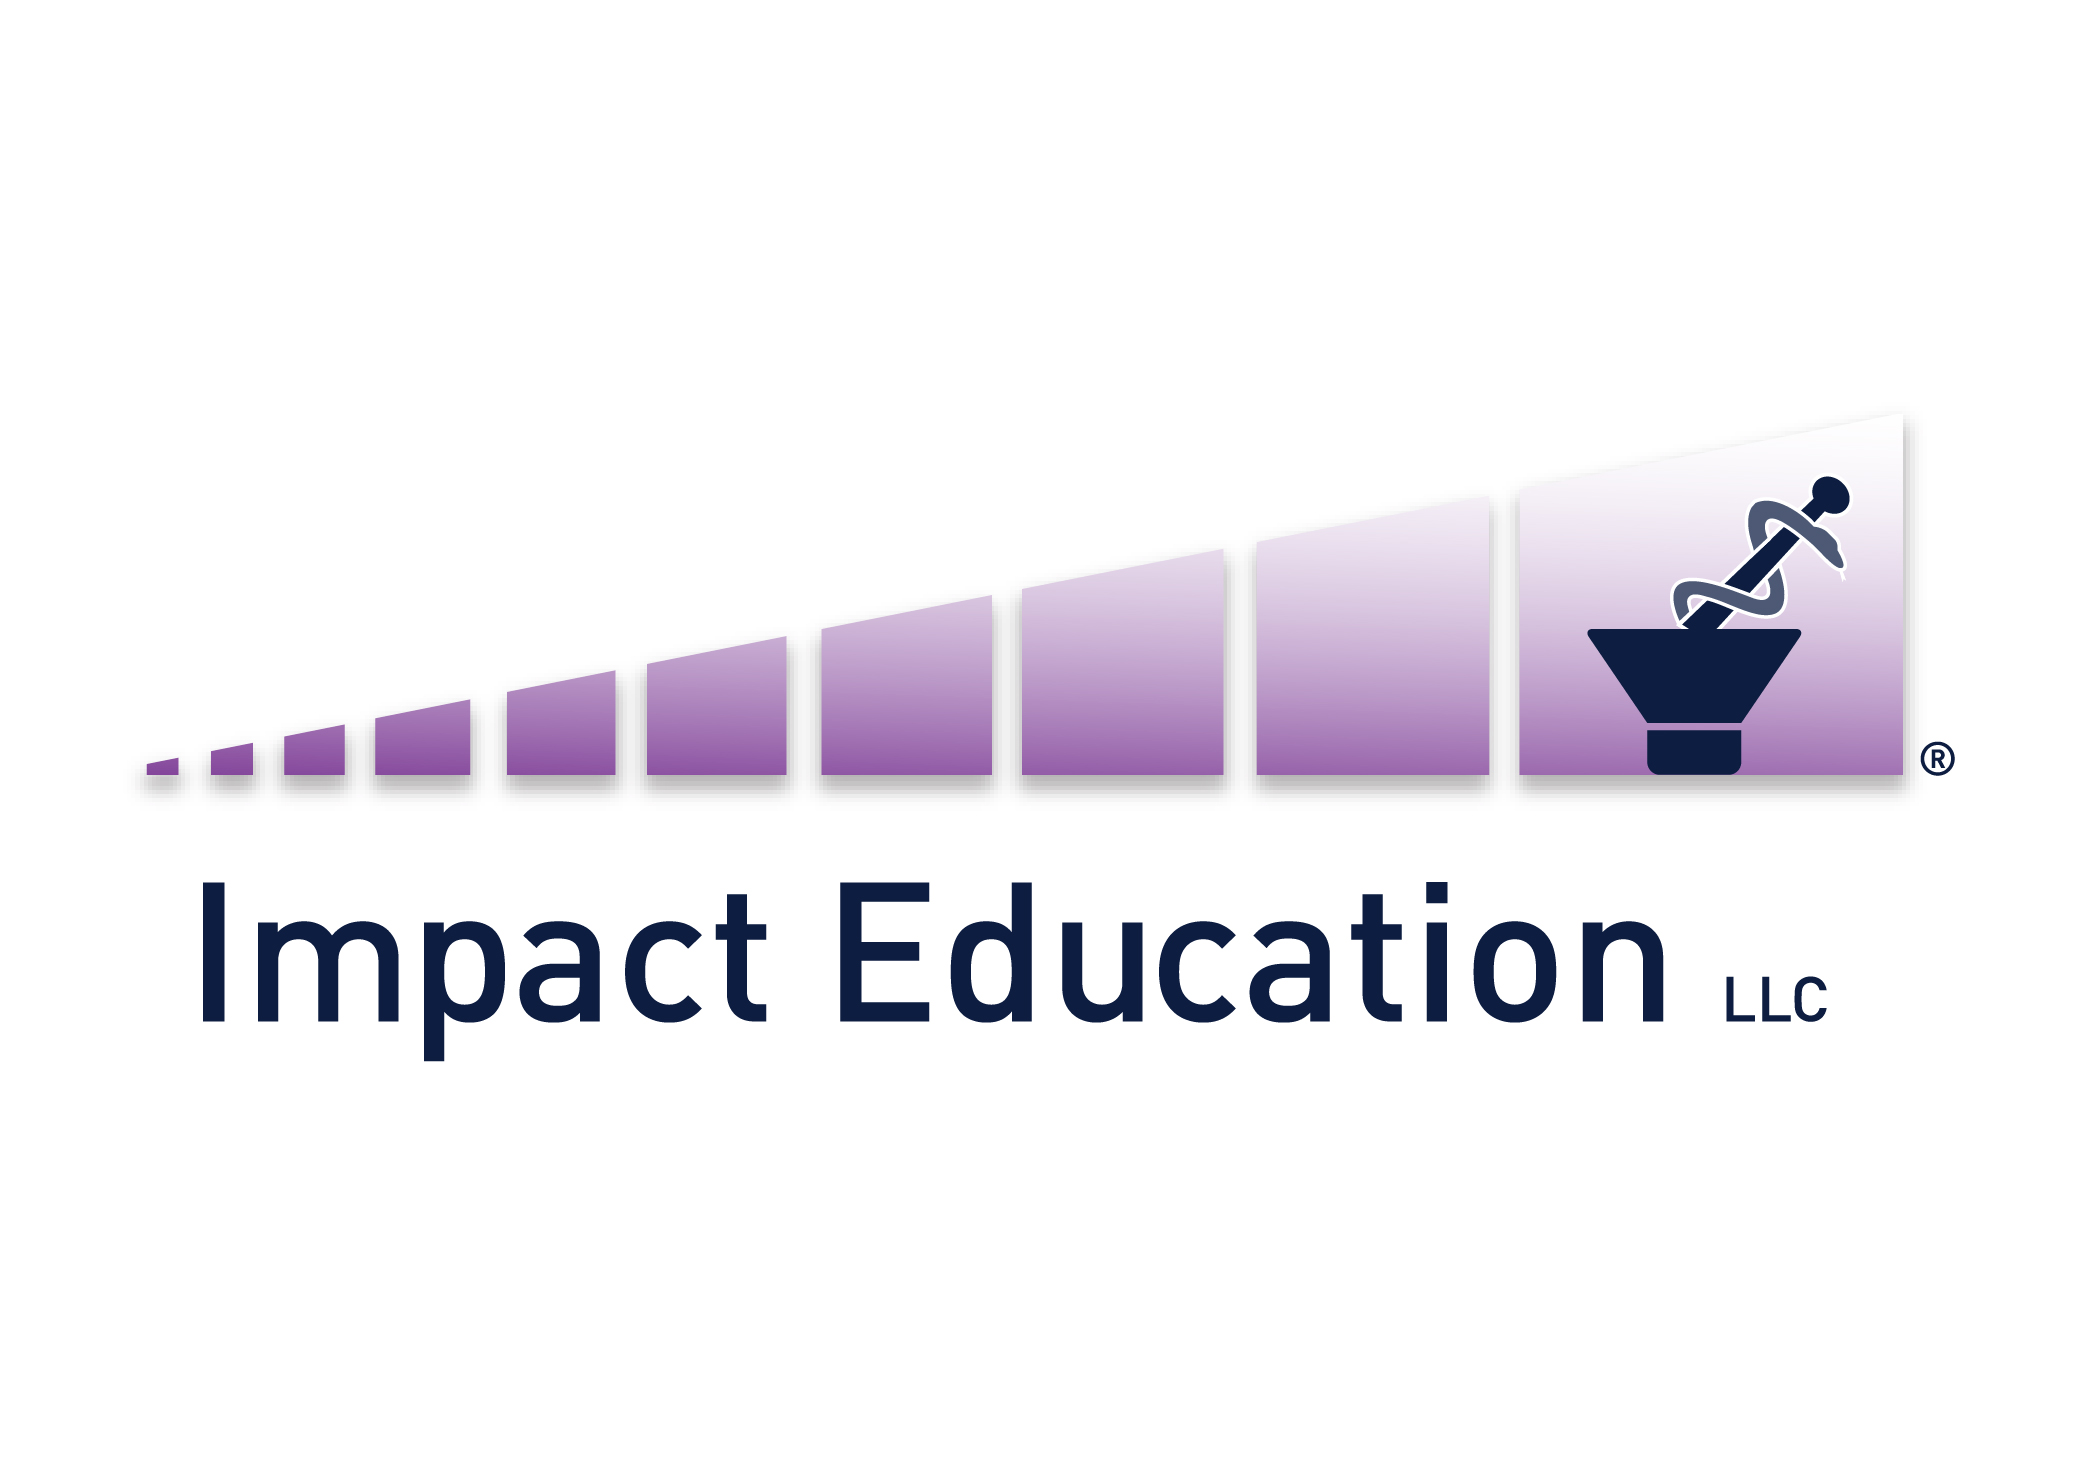 Impact Education